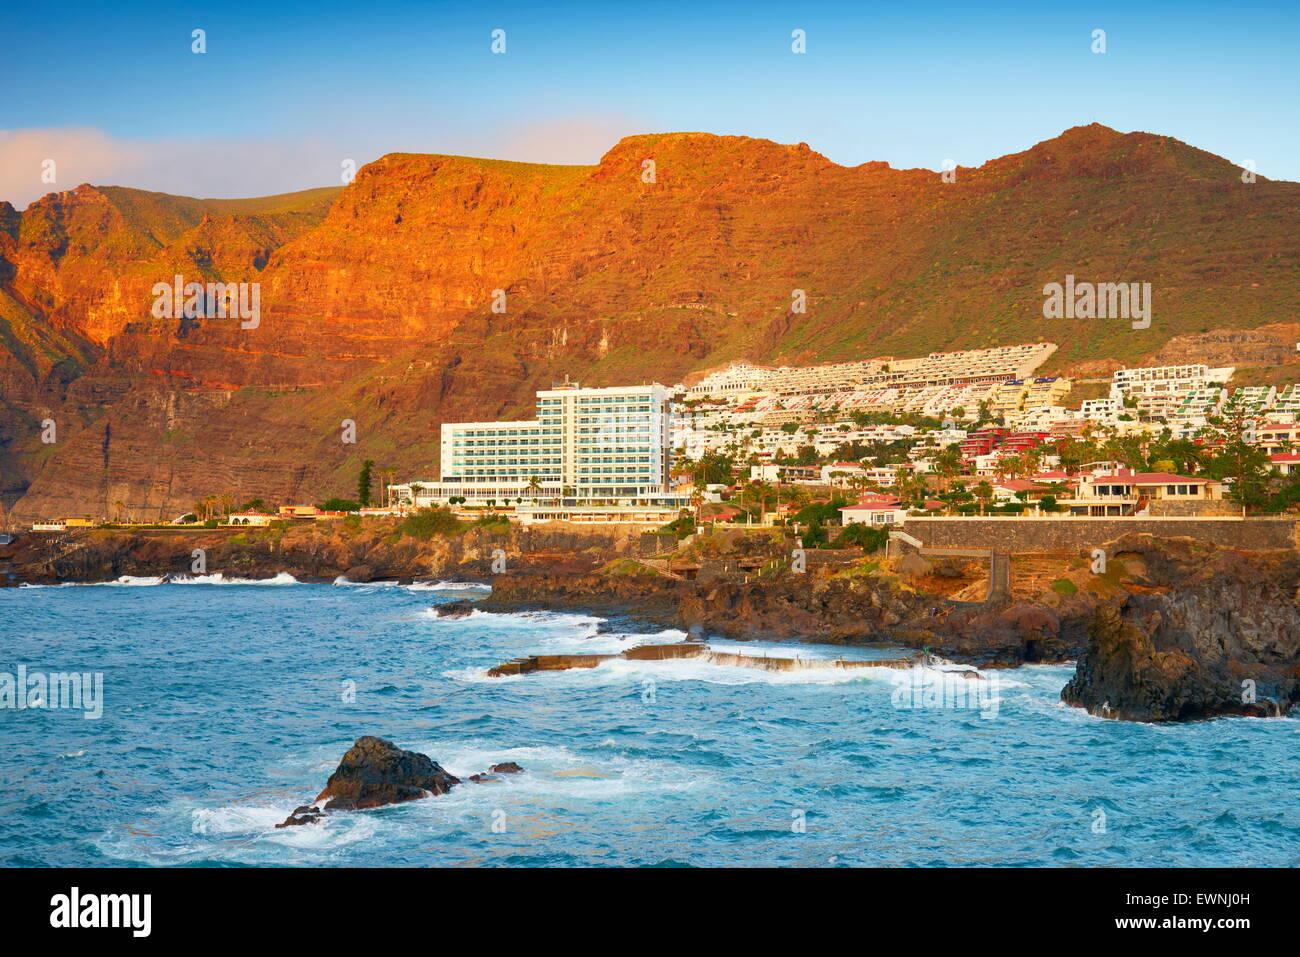 Los Gigantes Cliff, Tenerife, Isole Canarie, Spagna Immagini Stock